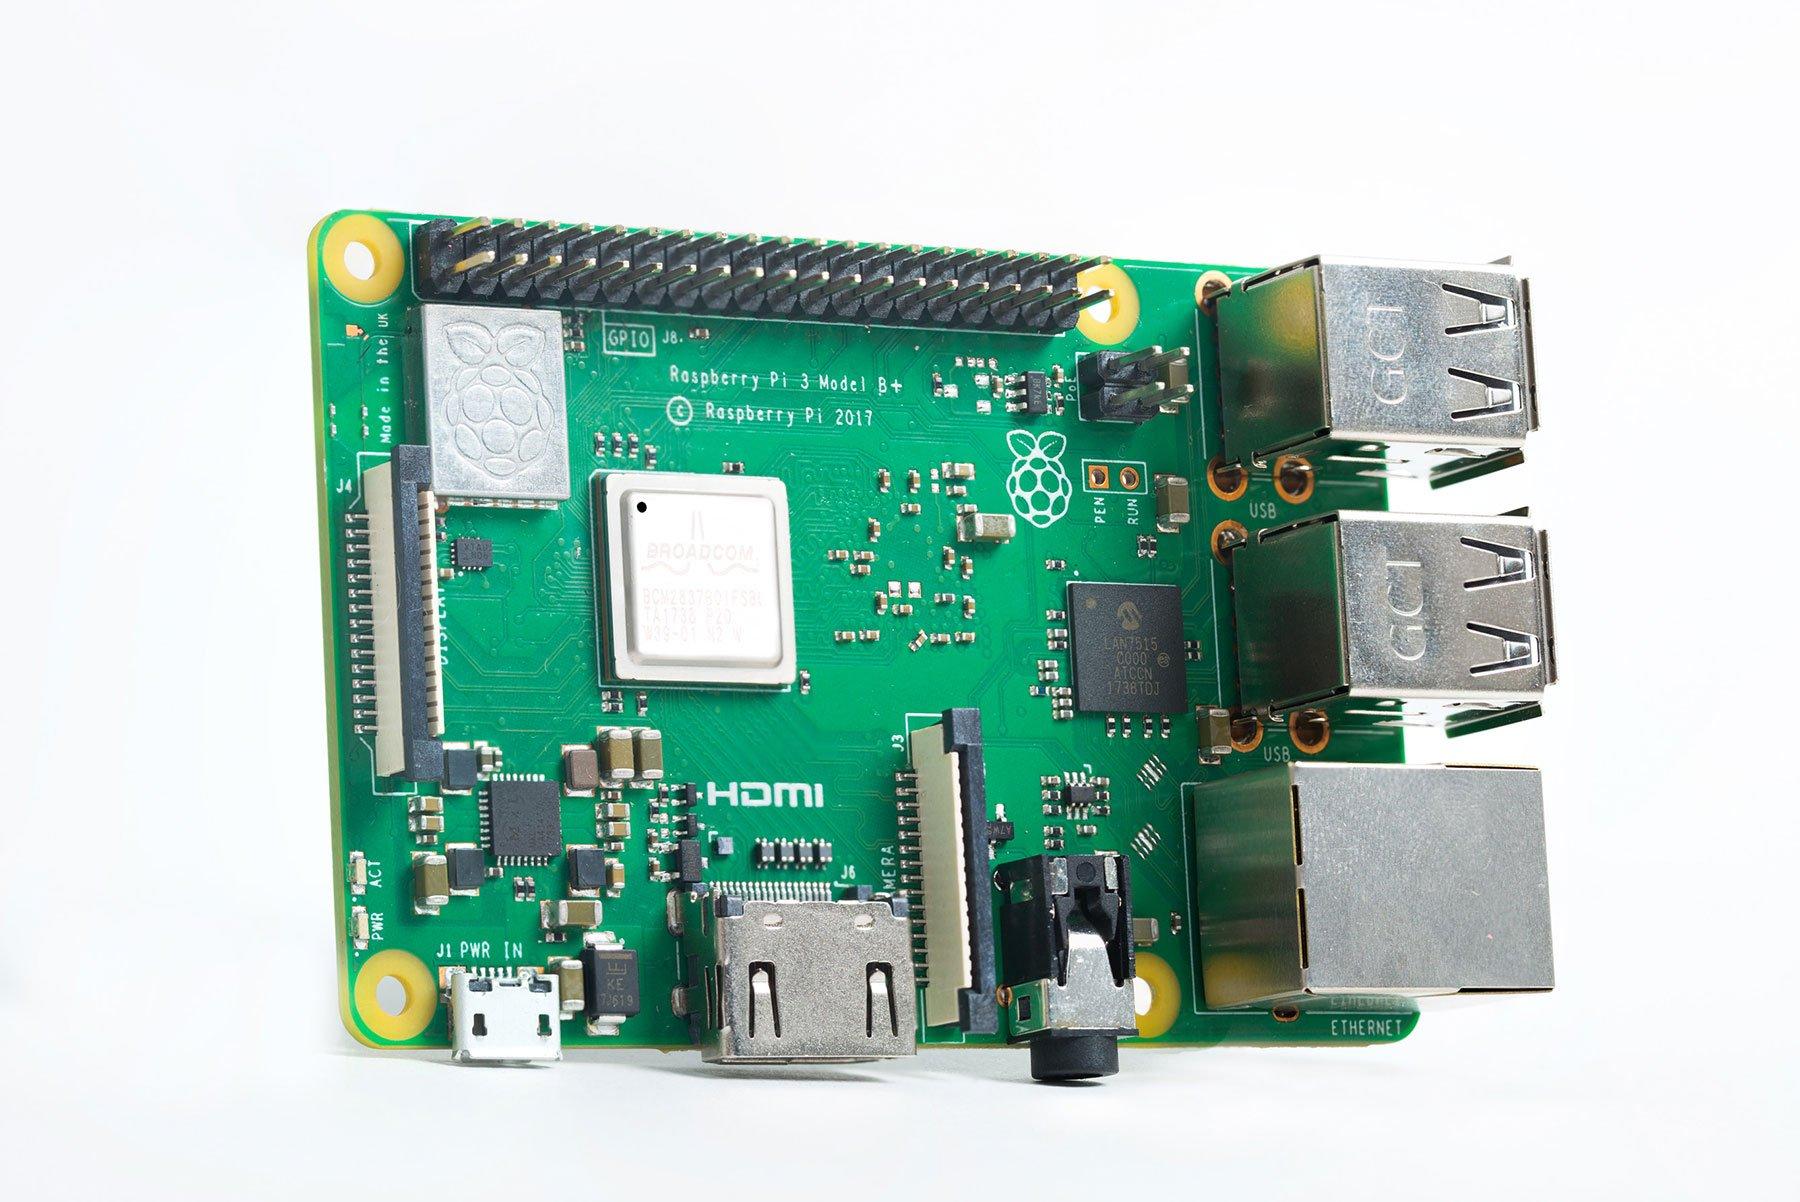 NeeGo Raspberry Pi 3 B+ (B Plus) Basic Kit Pi Barebones Computer Motherboard with 64bit Quad Core CPU & 1GB RAM, Black Pi3 Case, 2.5A Power Supply & Heatsink 2-Pack by NeeGo (Image #5)